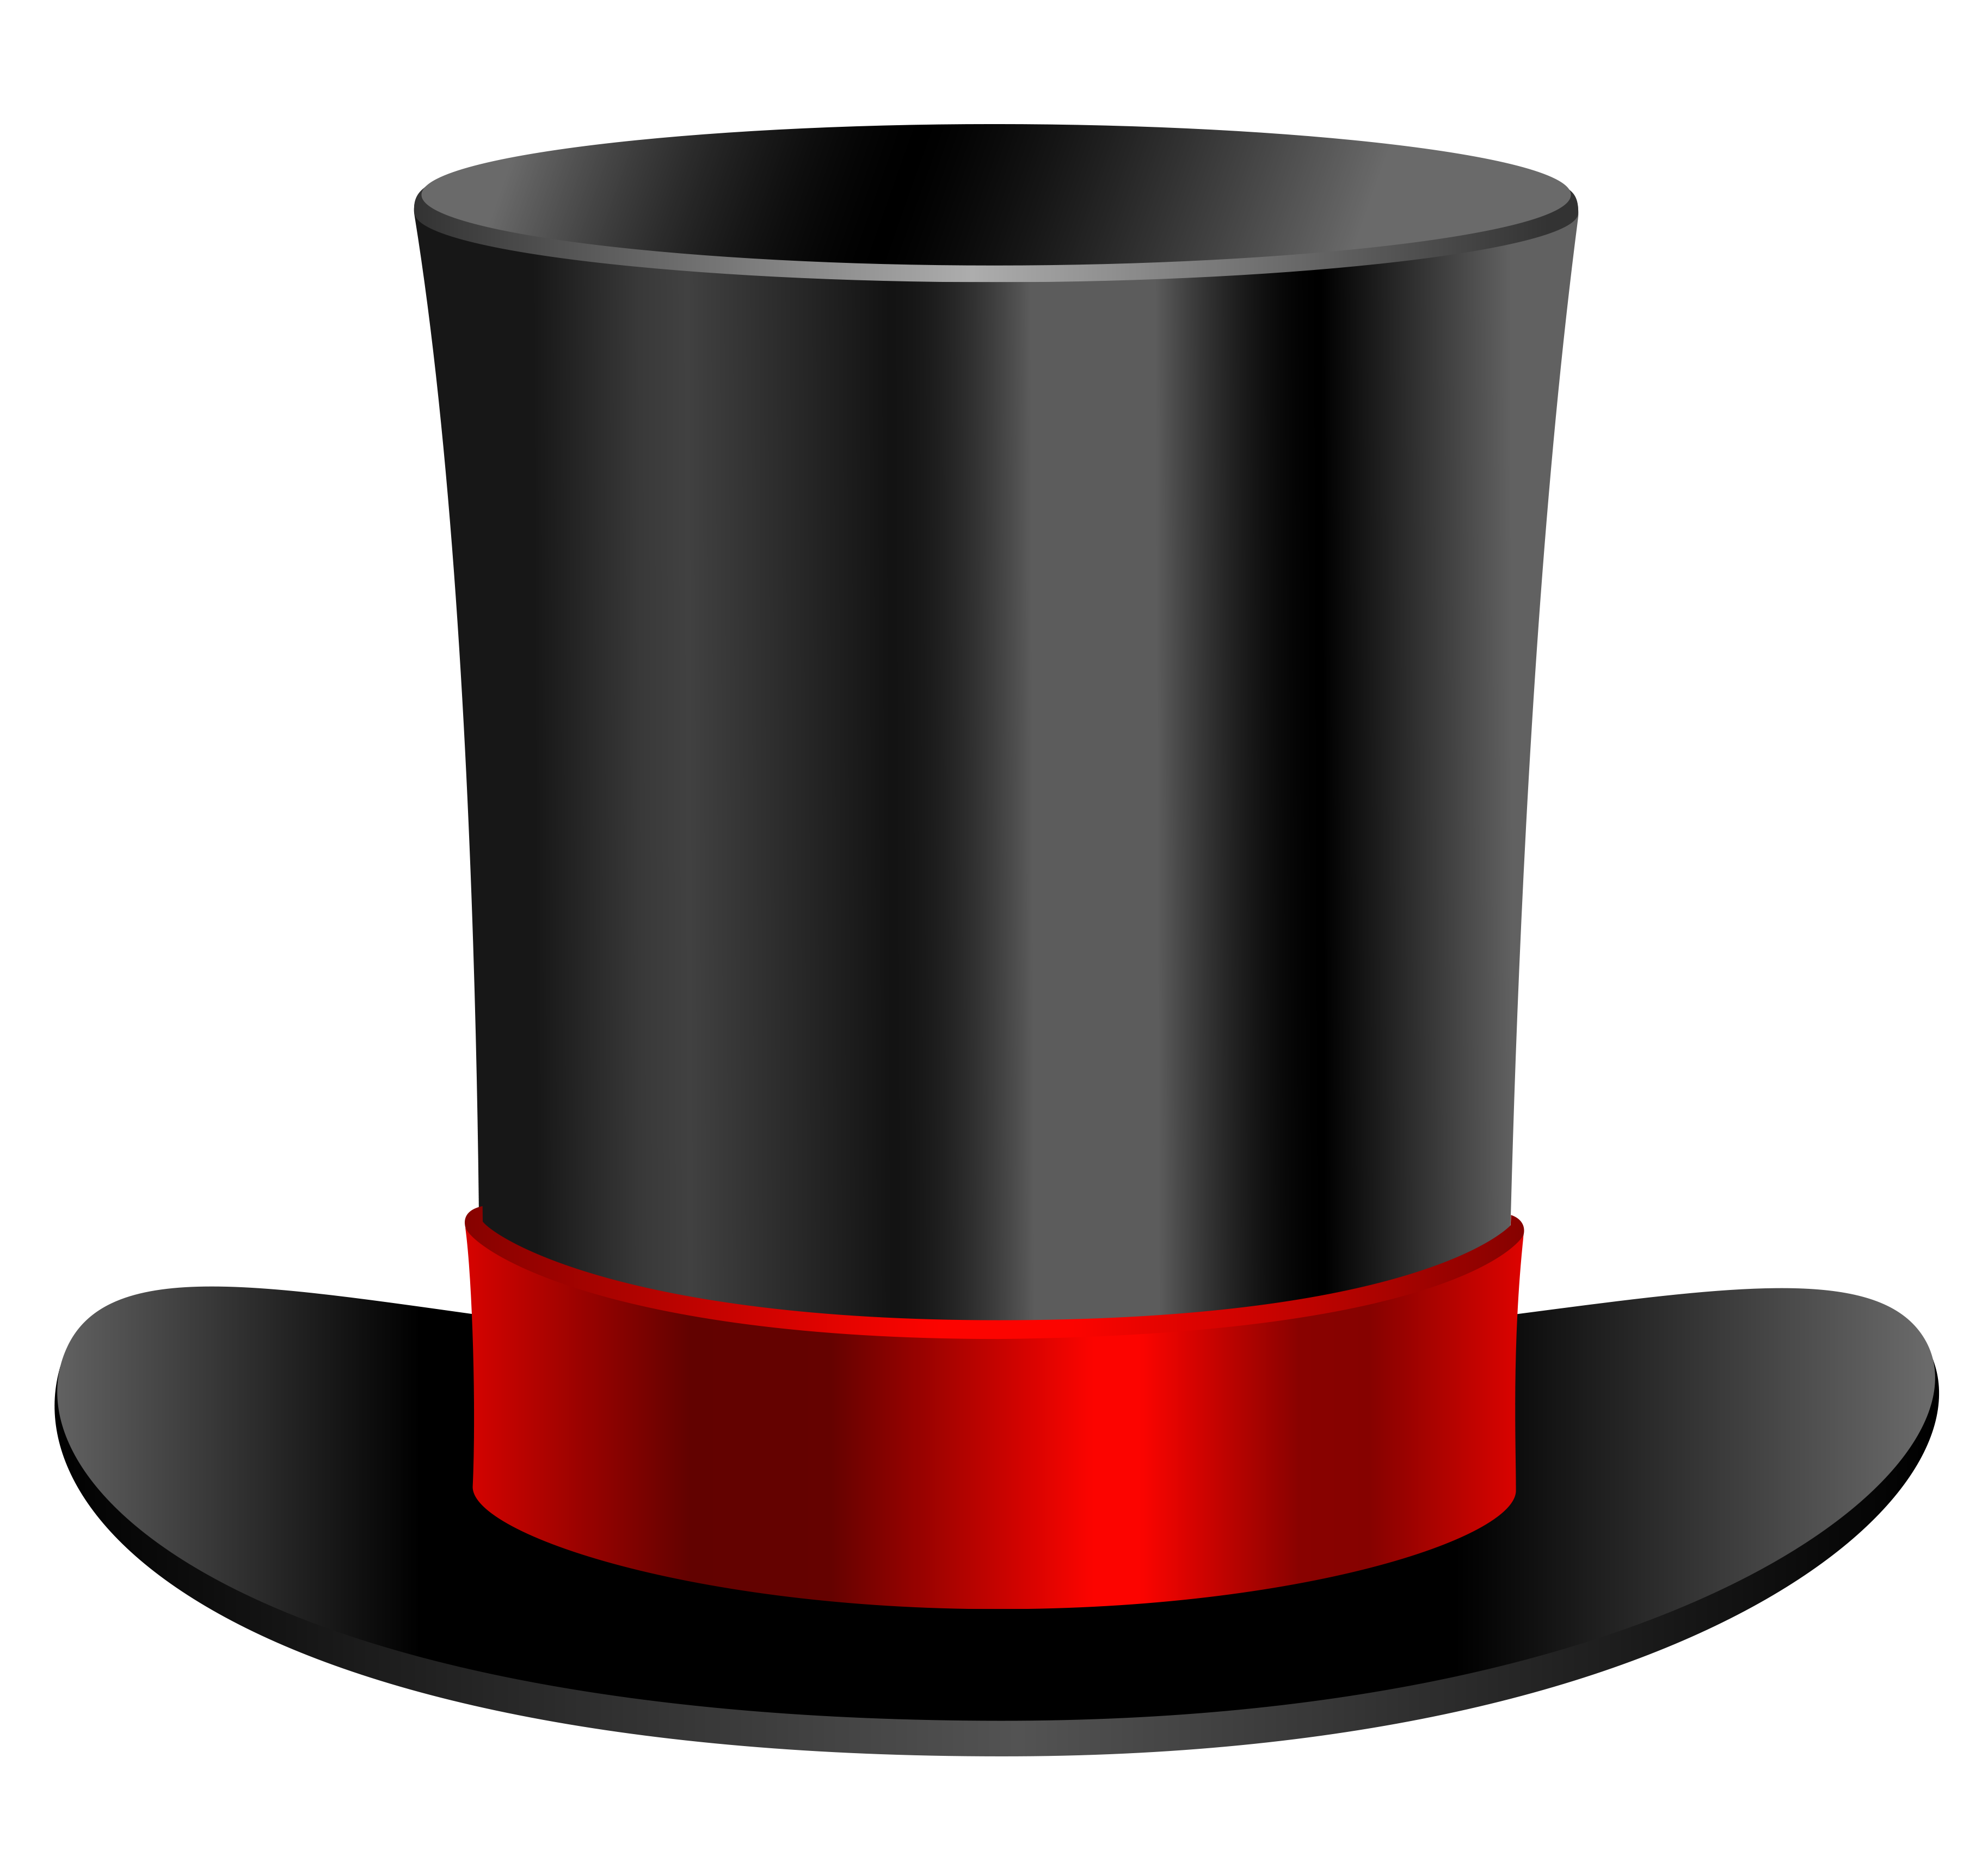 Top hat gallery yopriceville. Clipart mustache stache